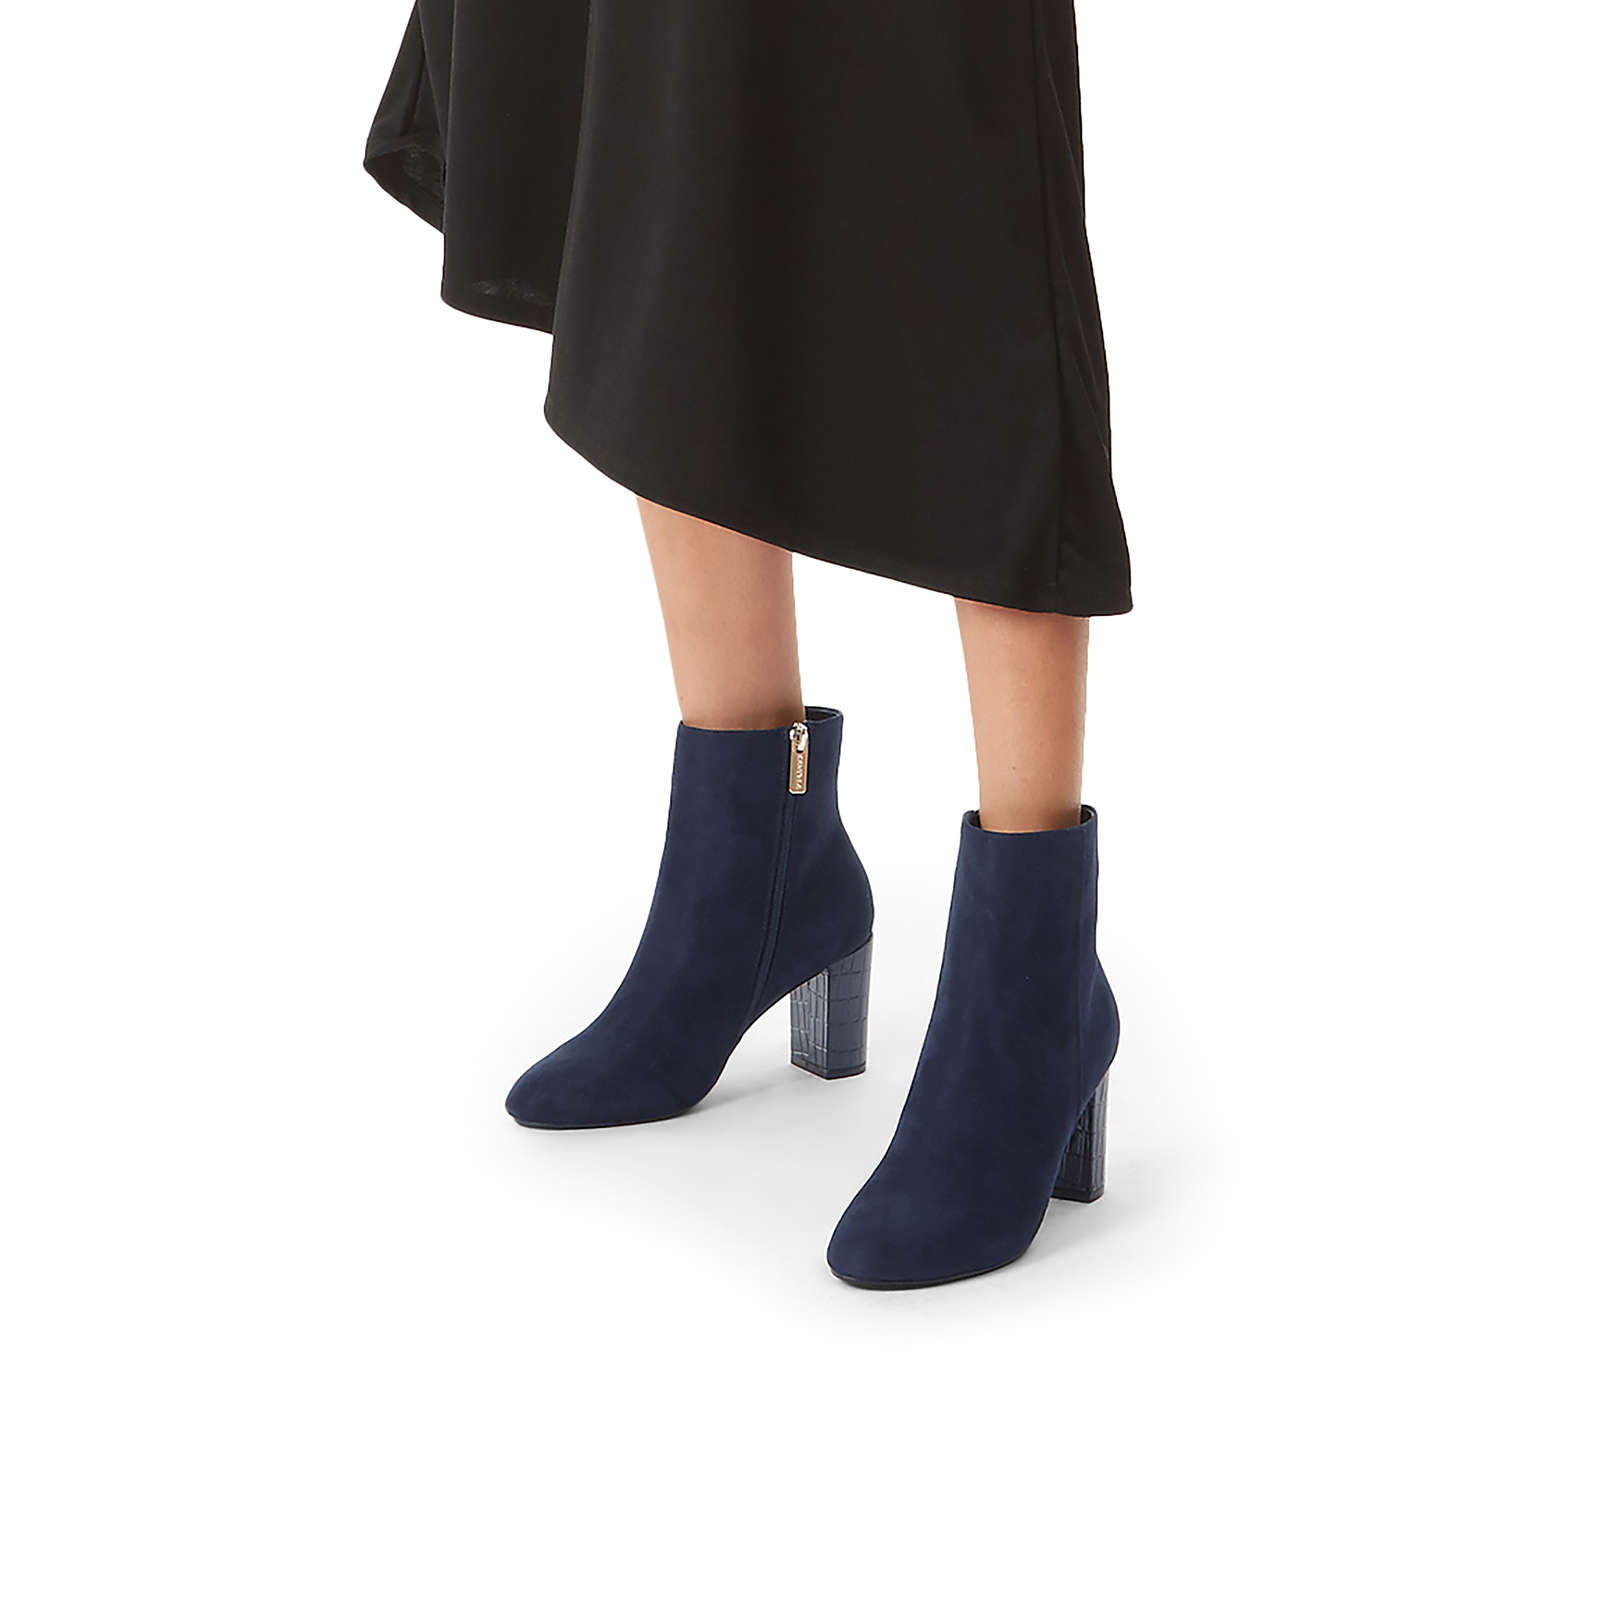 SIMMER - CARVELA Ankle Boots